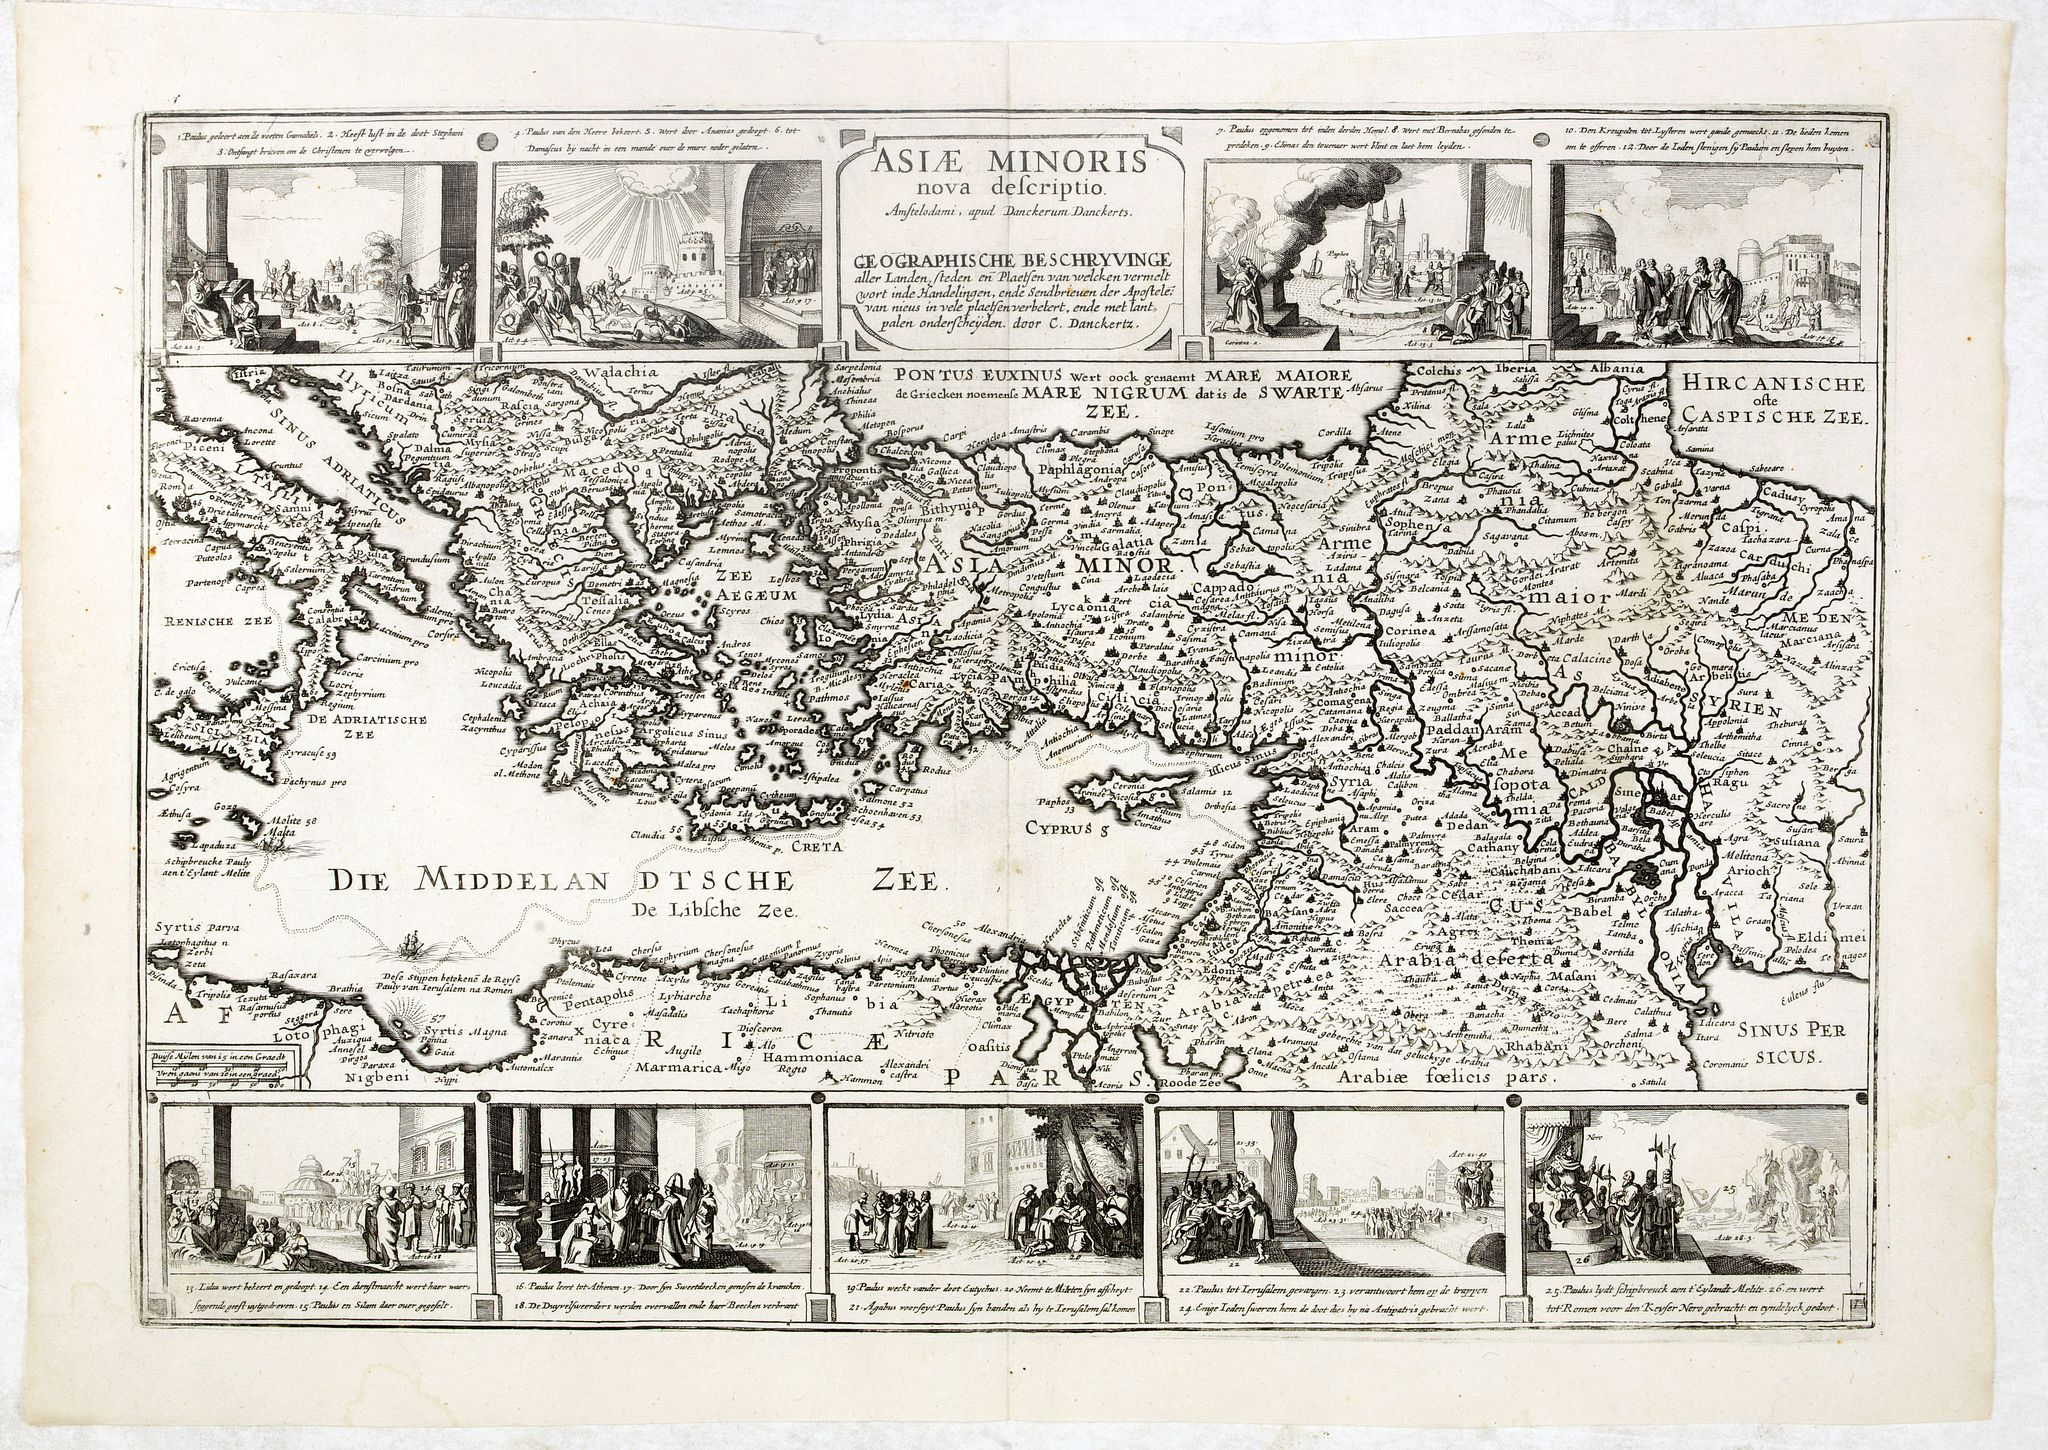 DANCKERTS, D. -  Asiae Minoris nova descriptio. Geographische Beschryvinge aller Landen... ende sendbrieuen der Apostele…